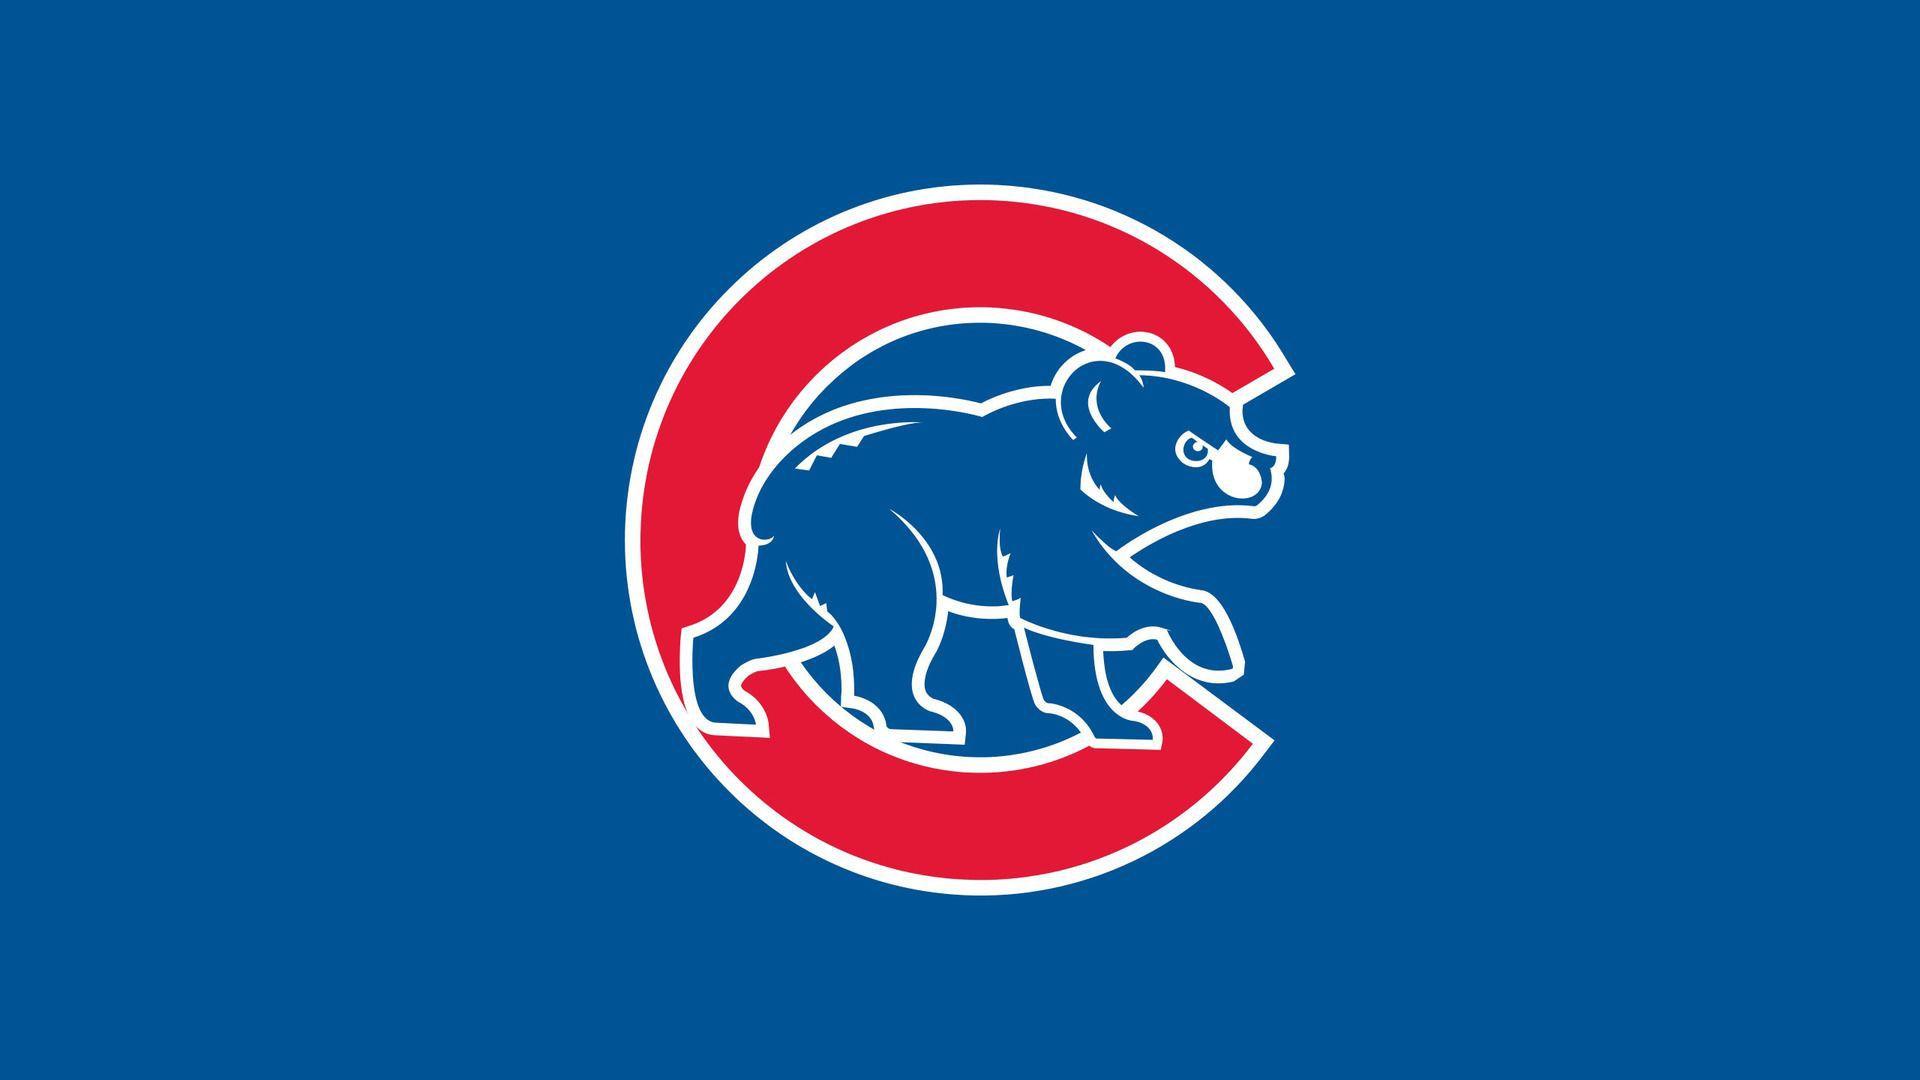 Chicago Cubs Wallpaper HD Chicago cubs wallpaper